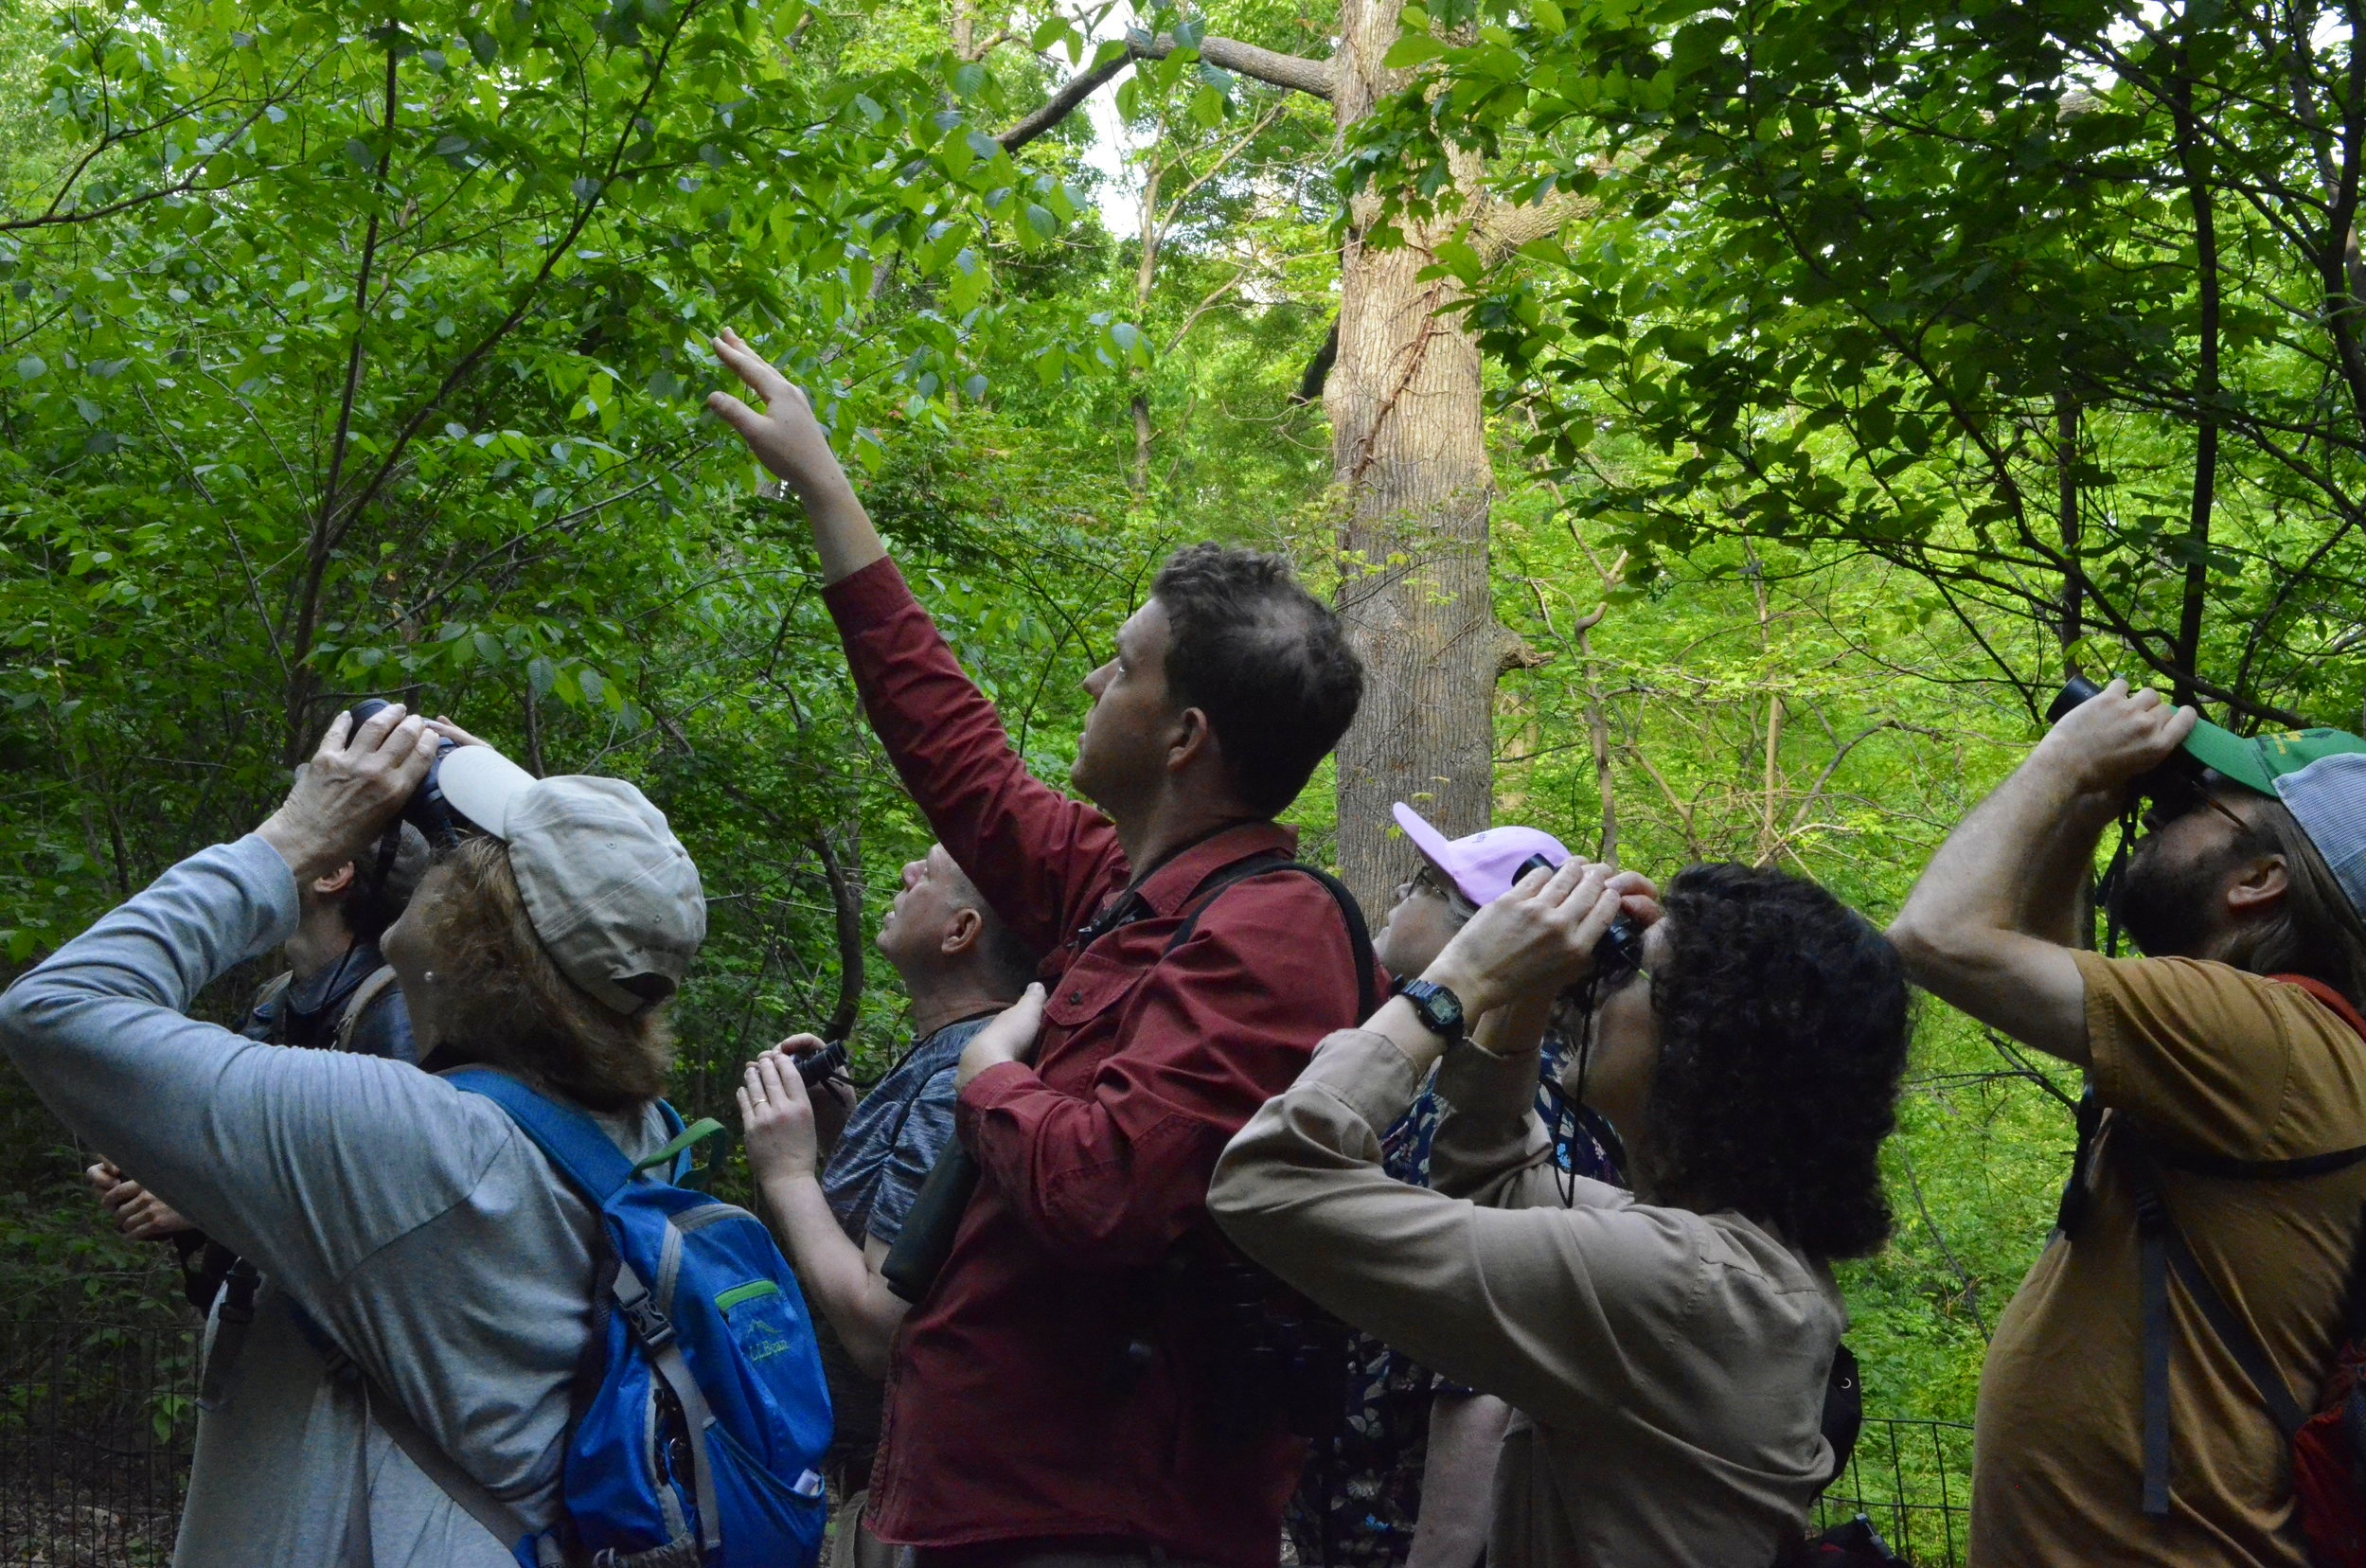 May 19 - Spring Birding with Luke Musher